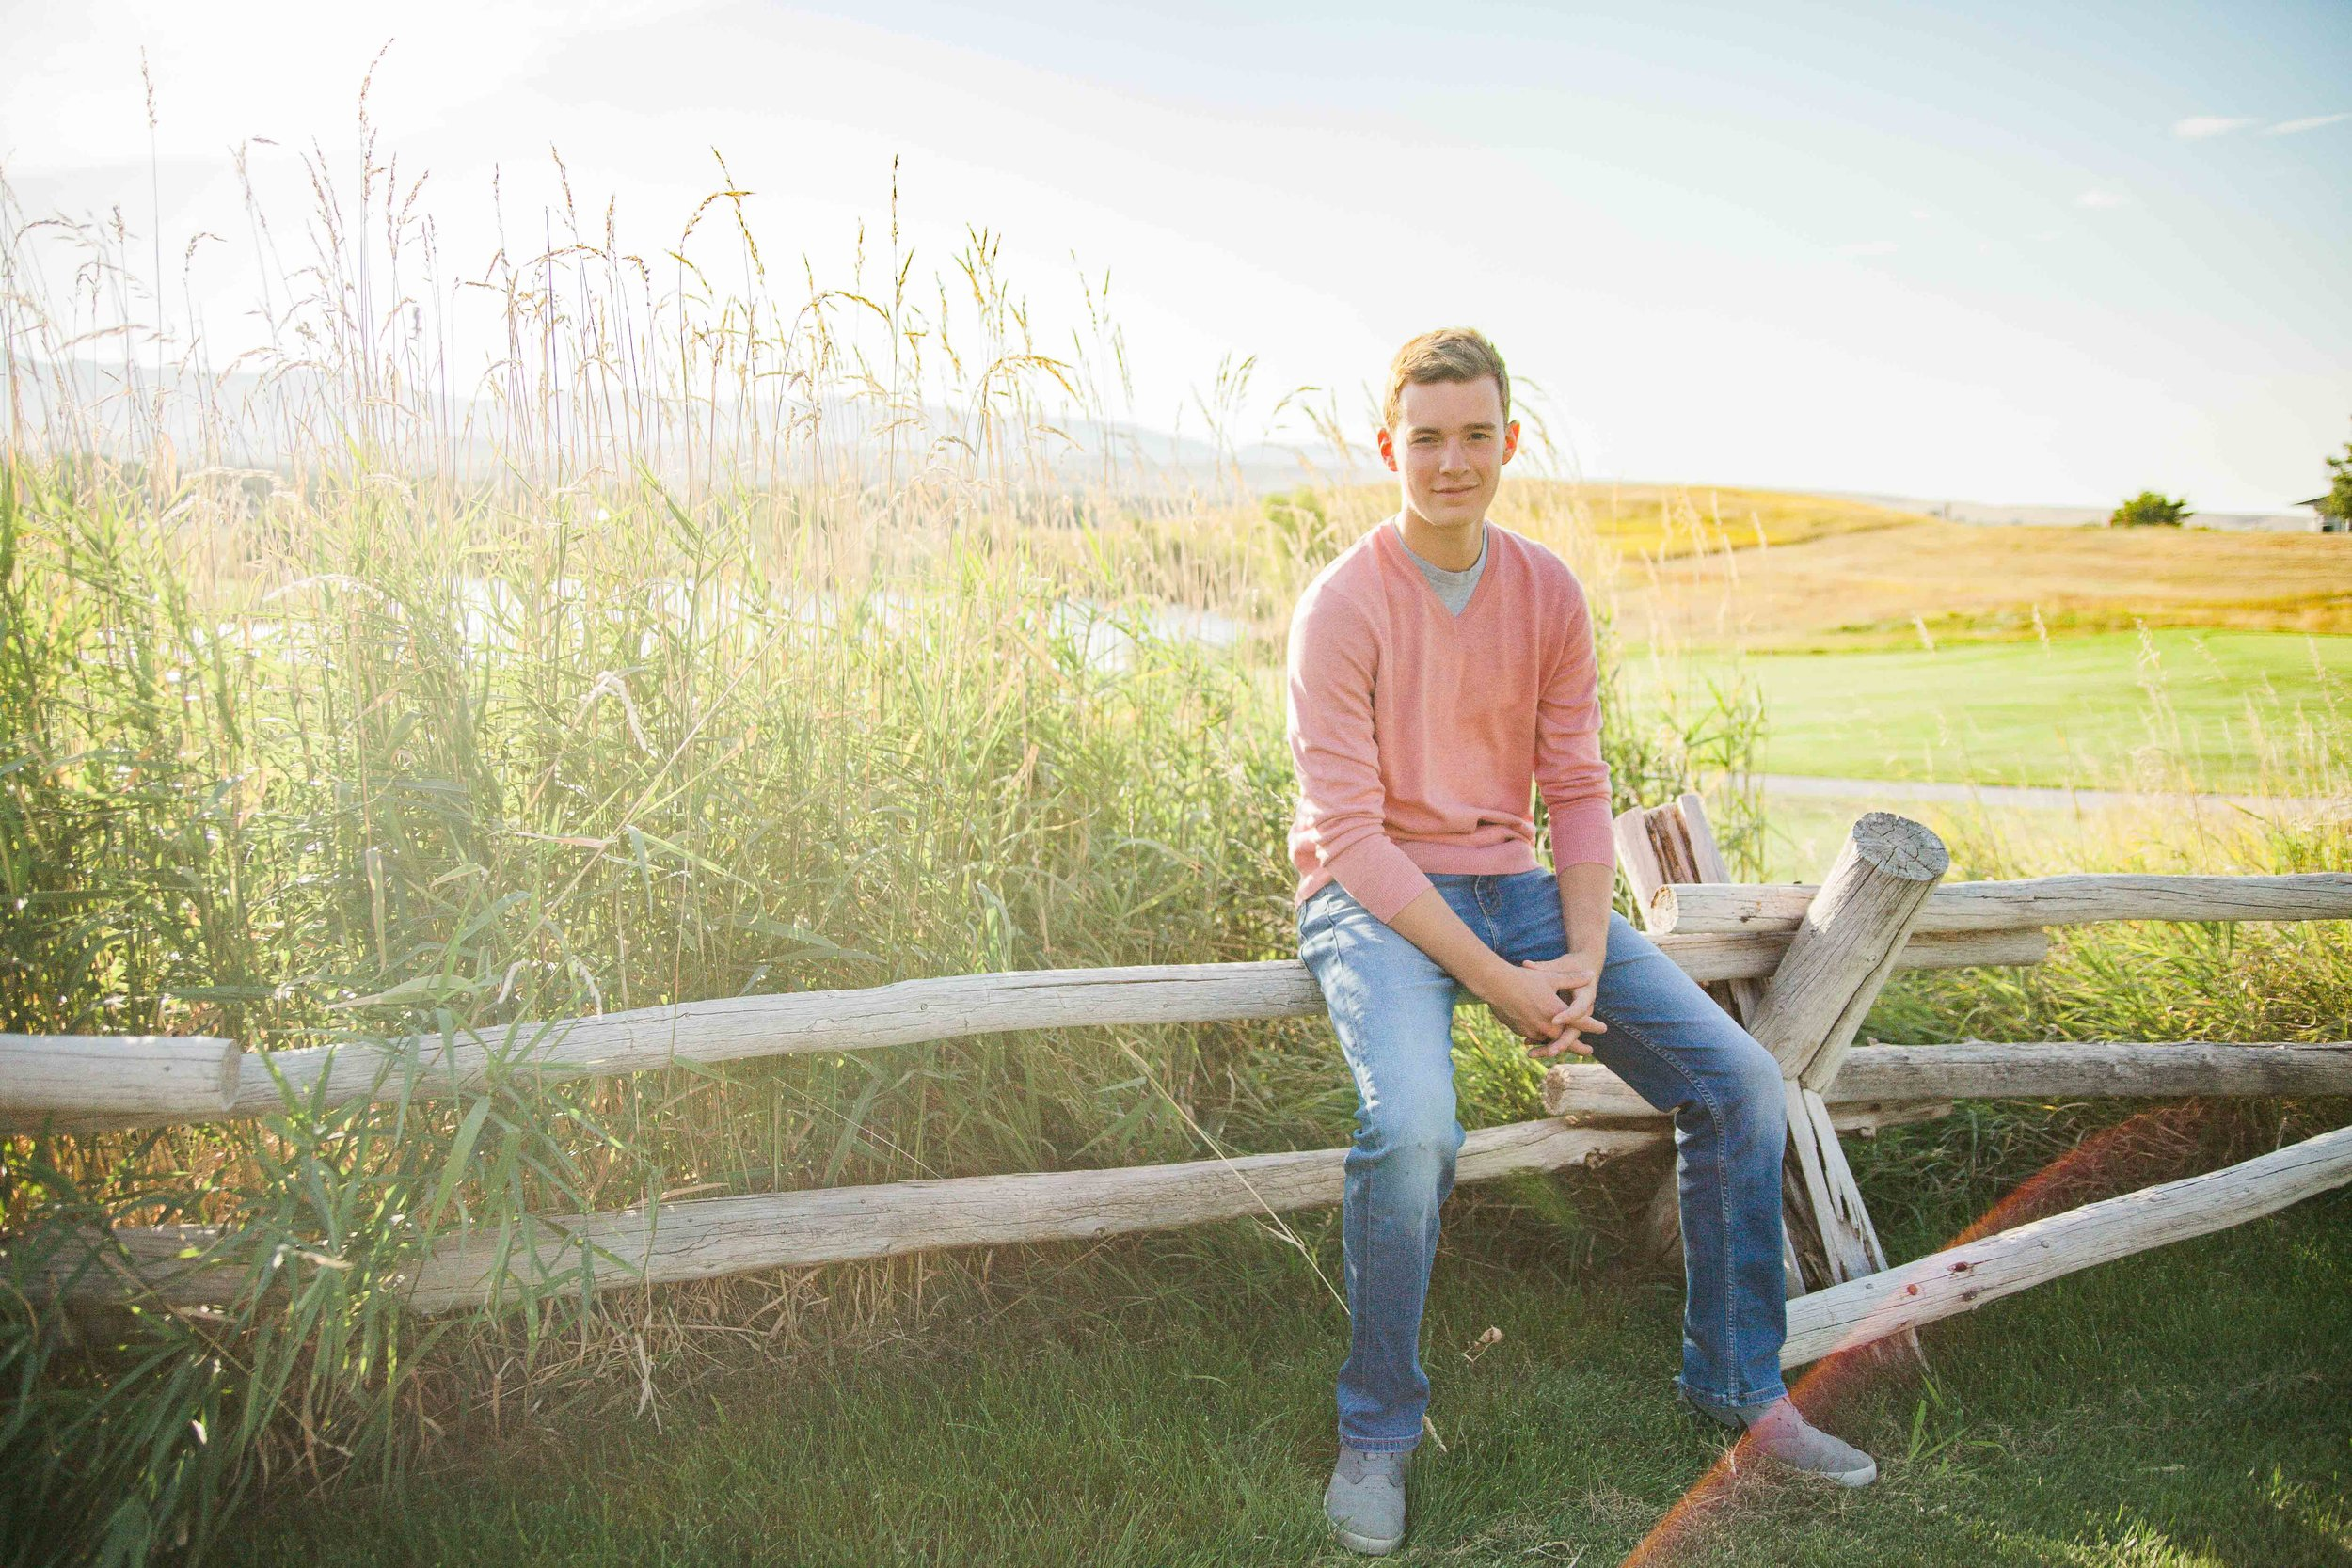 Sam's Senior Portrait Session at the Powderhorn Golf Club in Sheridan, Wyoming,